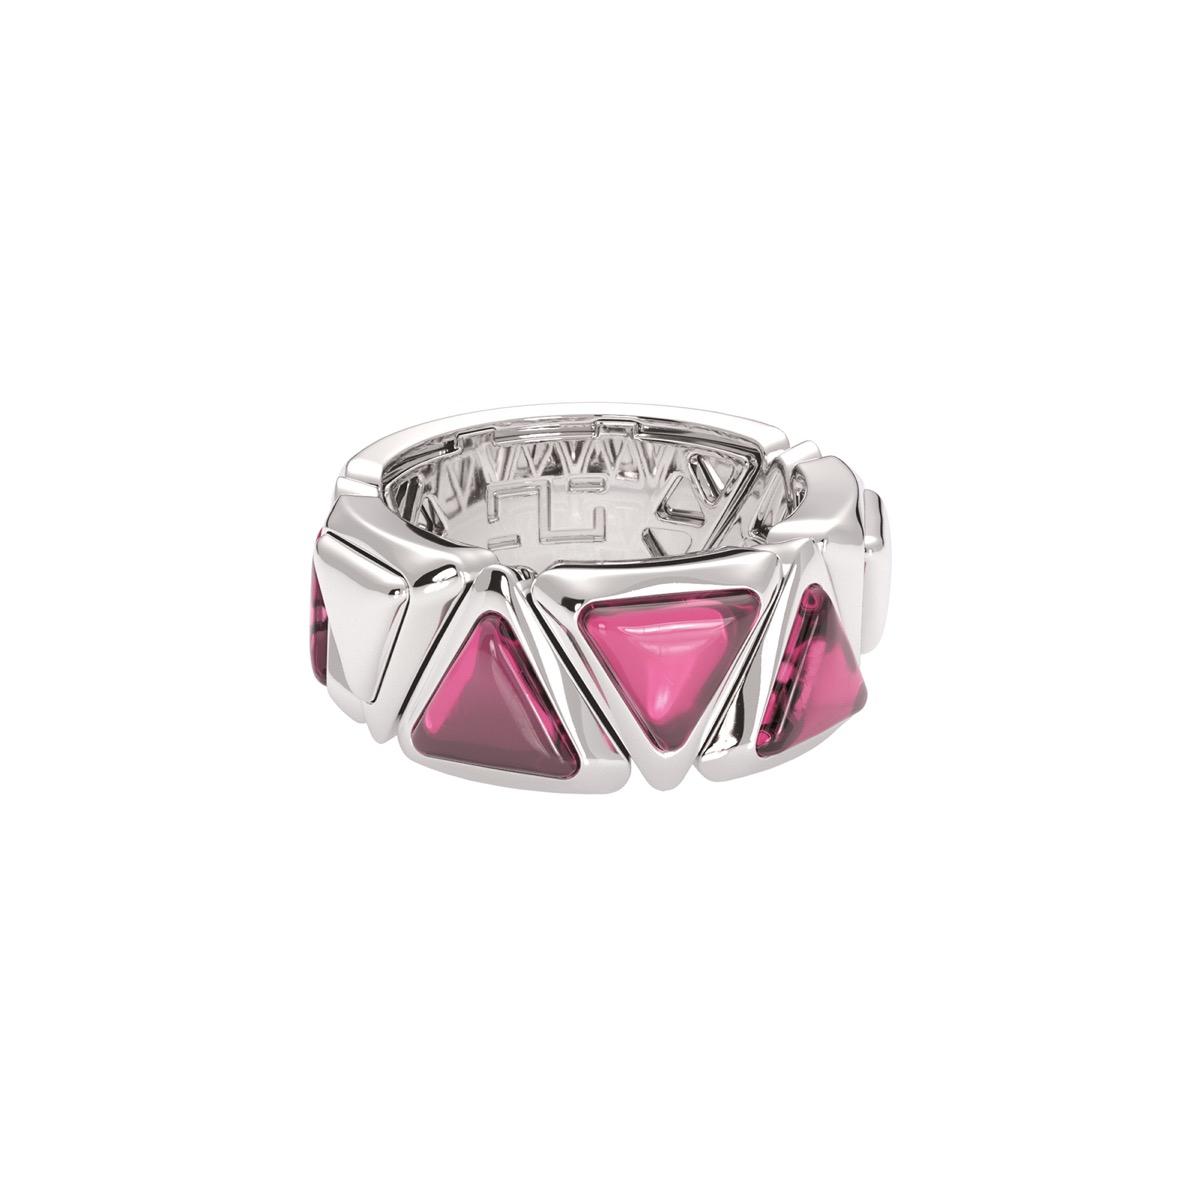 Ring Mirror Gem White Gold Pink Garnet